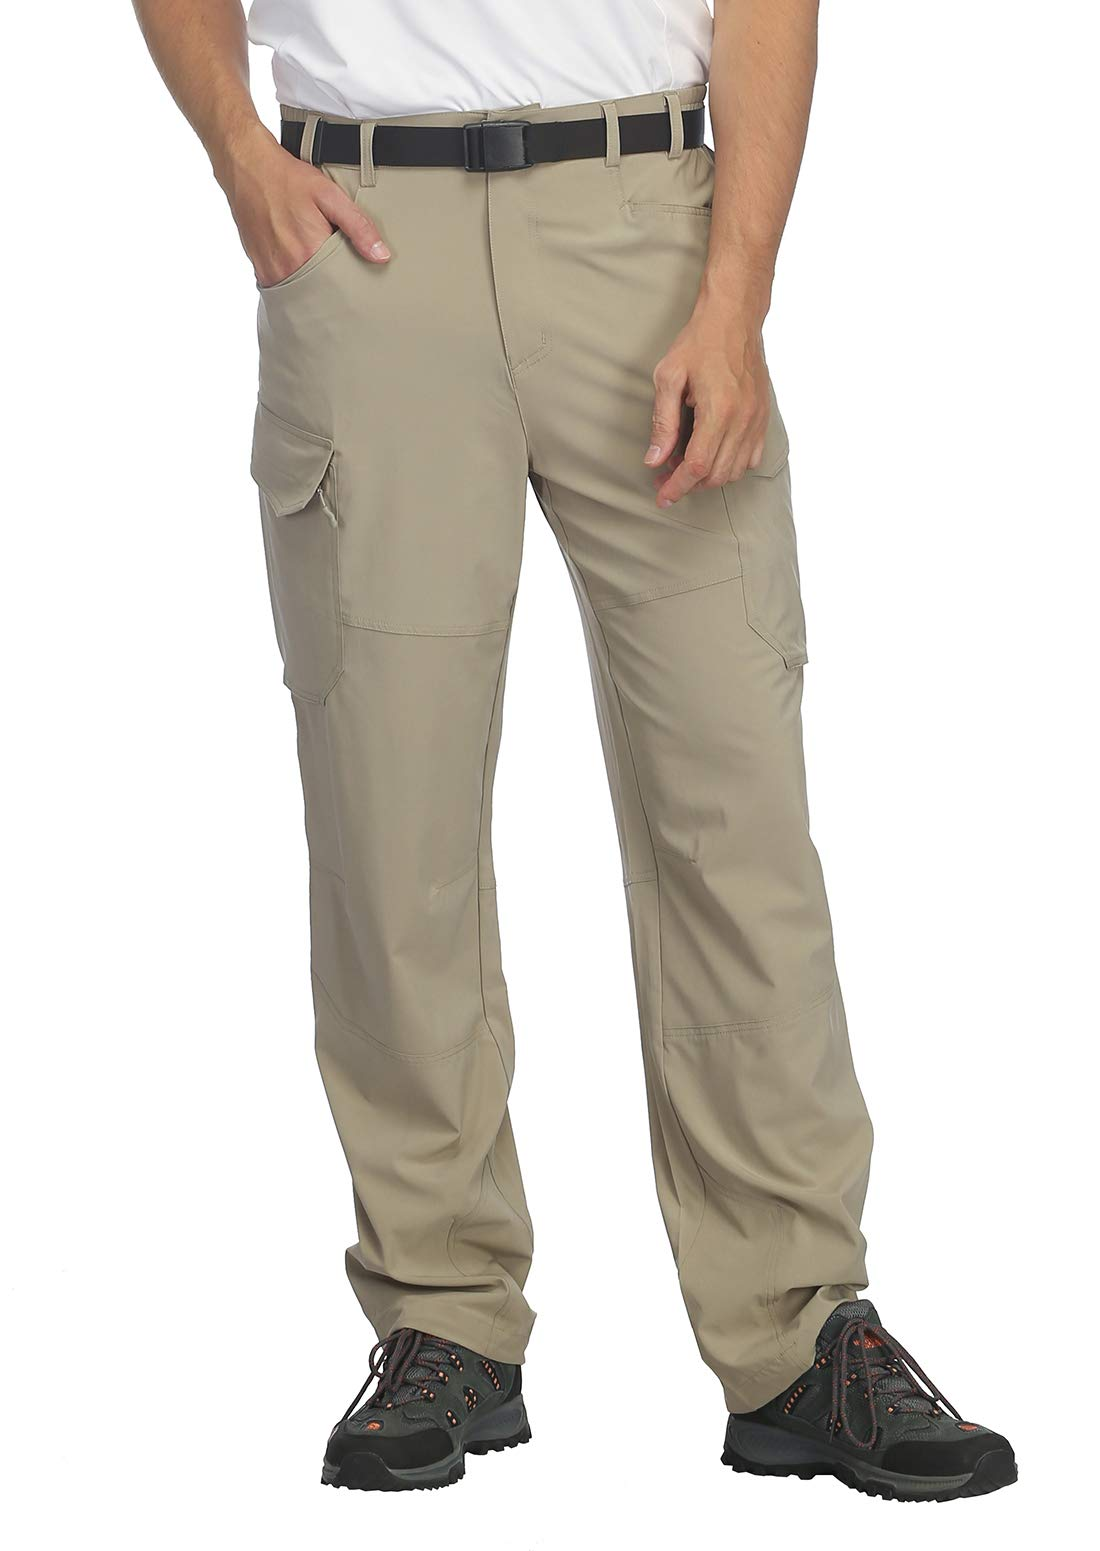 MIER Men's Lightweight Hiking Pants Quick Dry Outdoor Cargo Pants with Partial Elastic Waist, YKK Zipper, 5 Pockets, Rock Grey, M